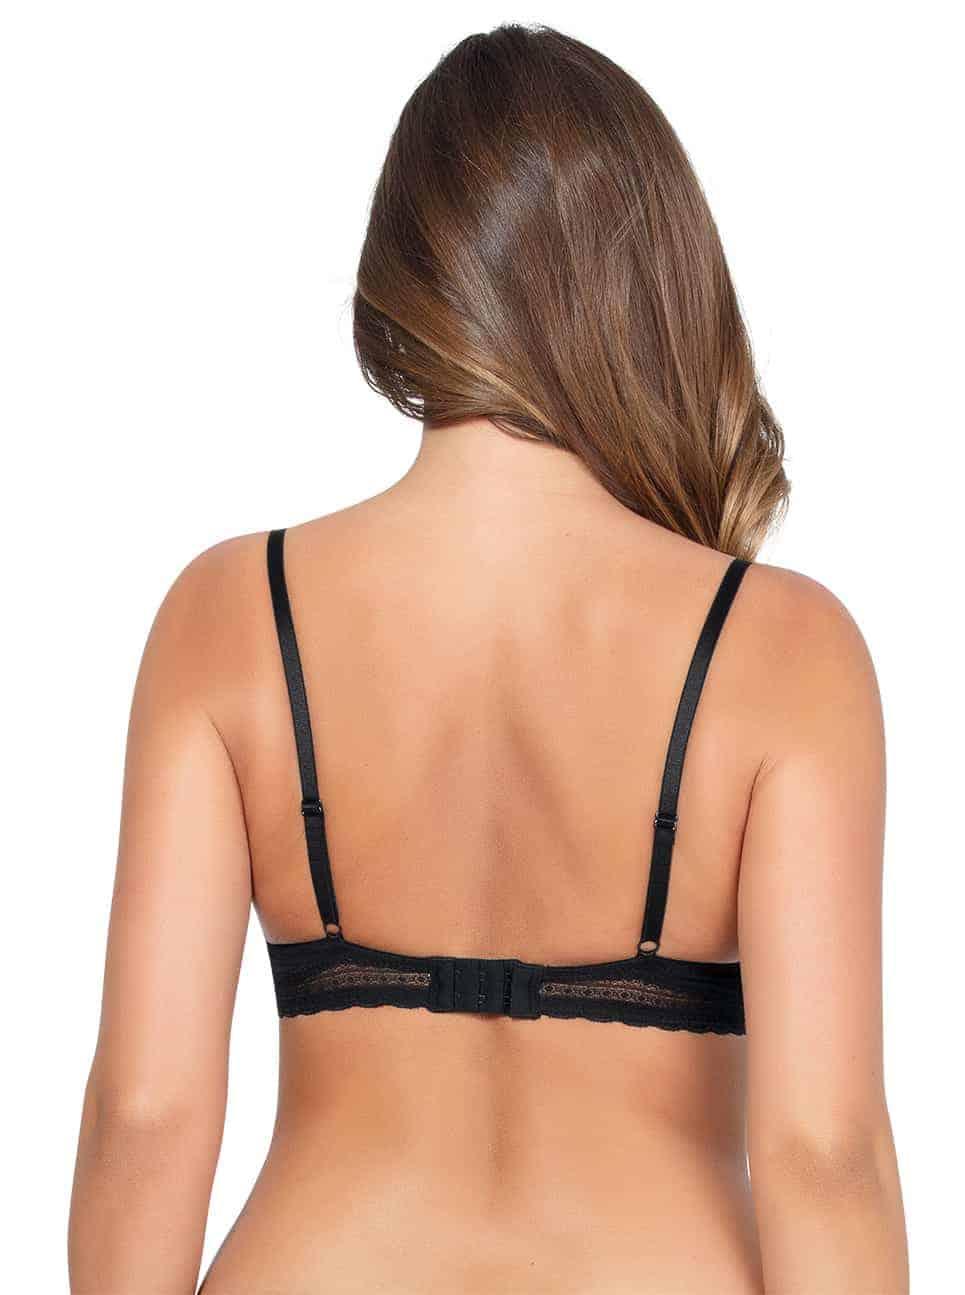 Emma Wire FreeSoftPaddedBraP5491 Black Back - Emma Wire-Free Soft Padded Bra - Black - P5491